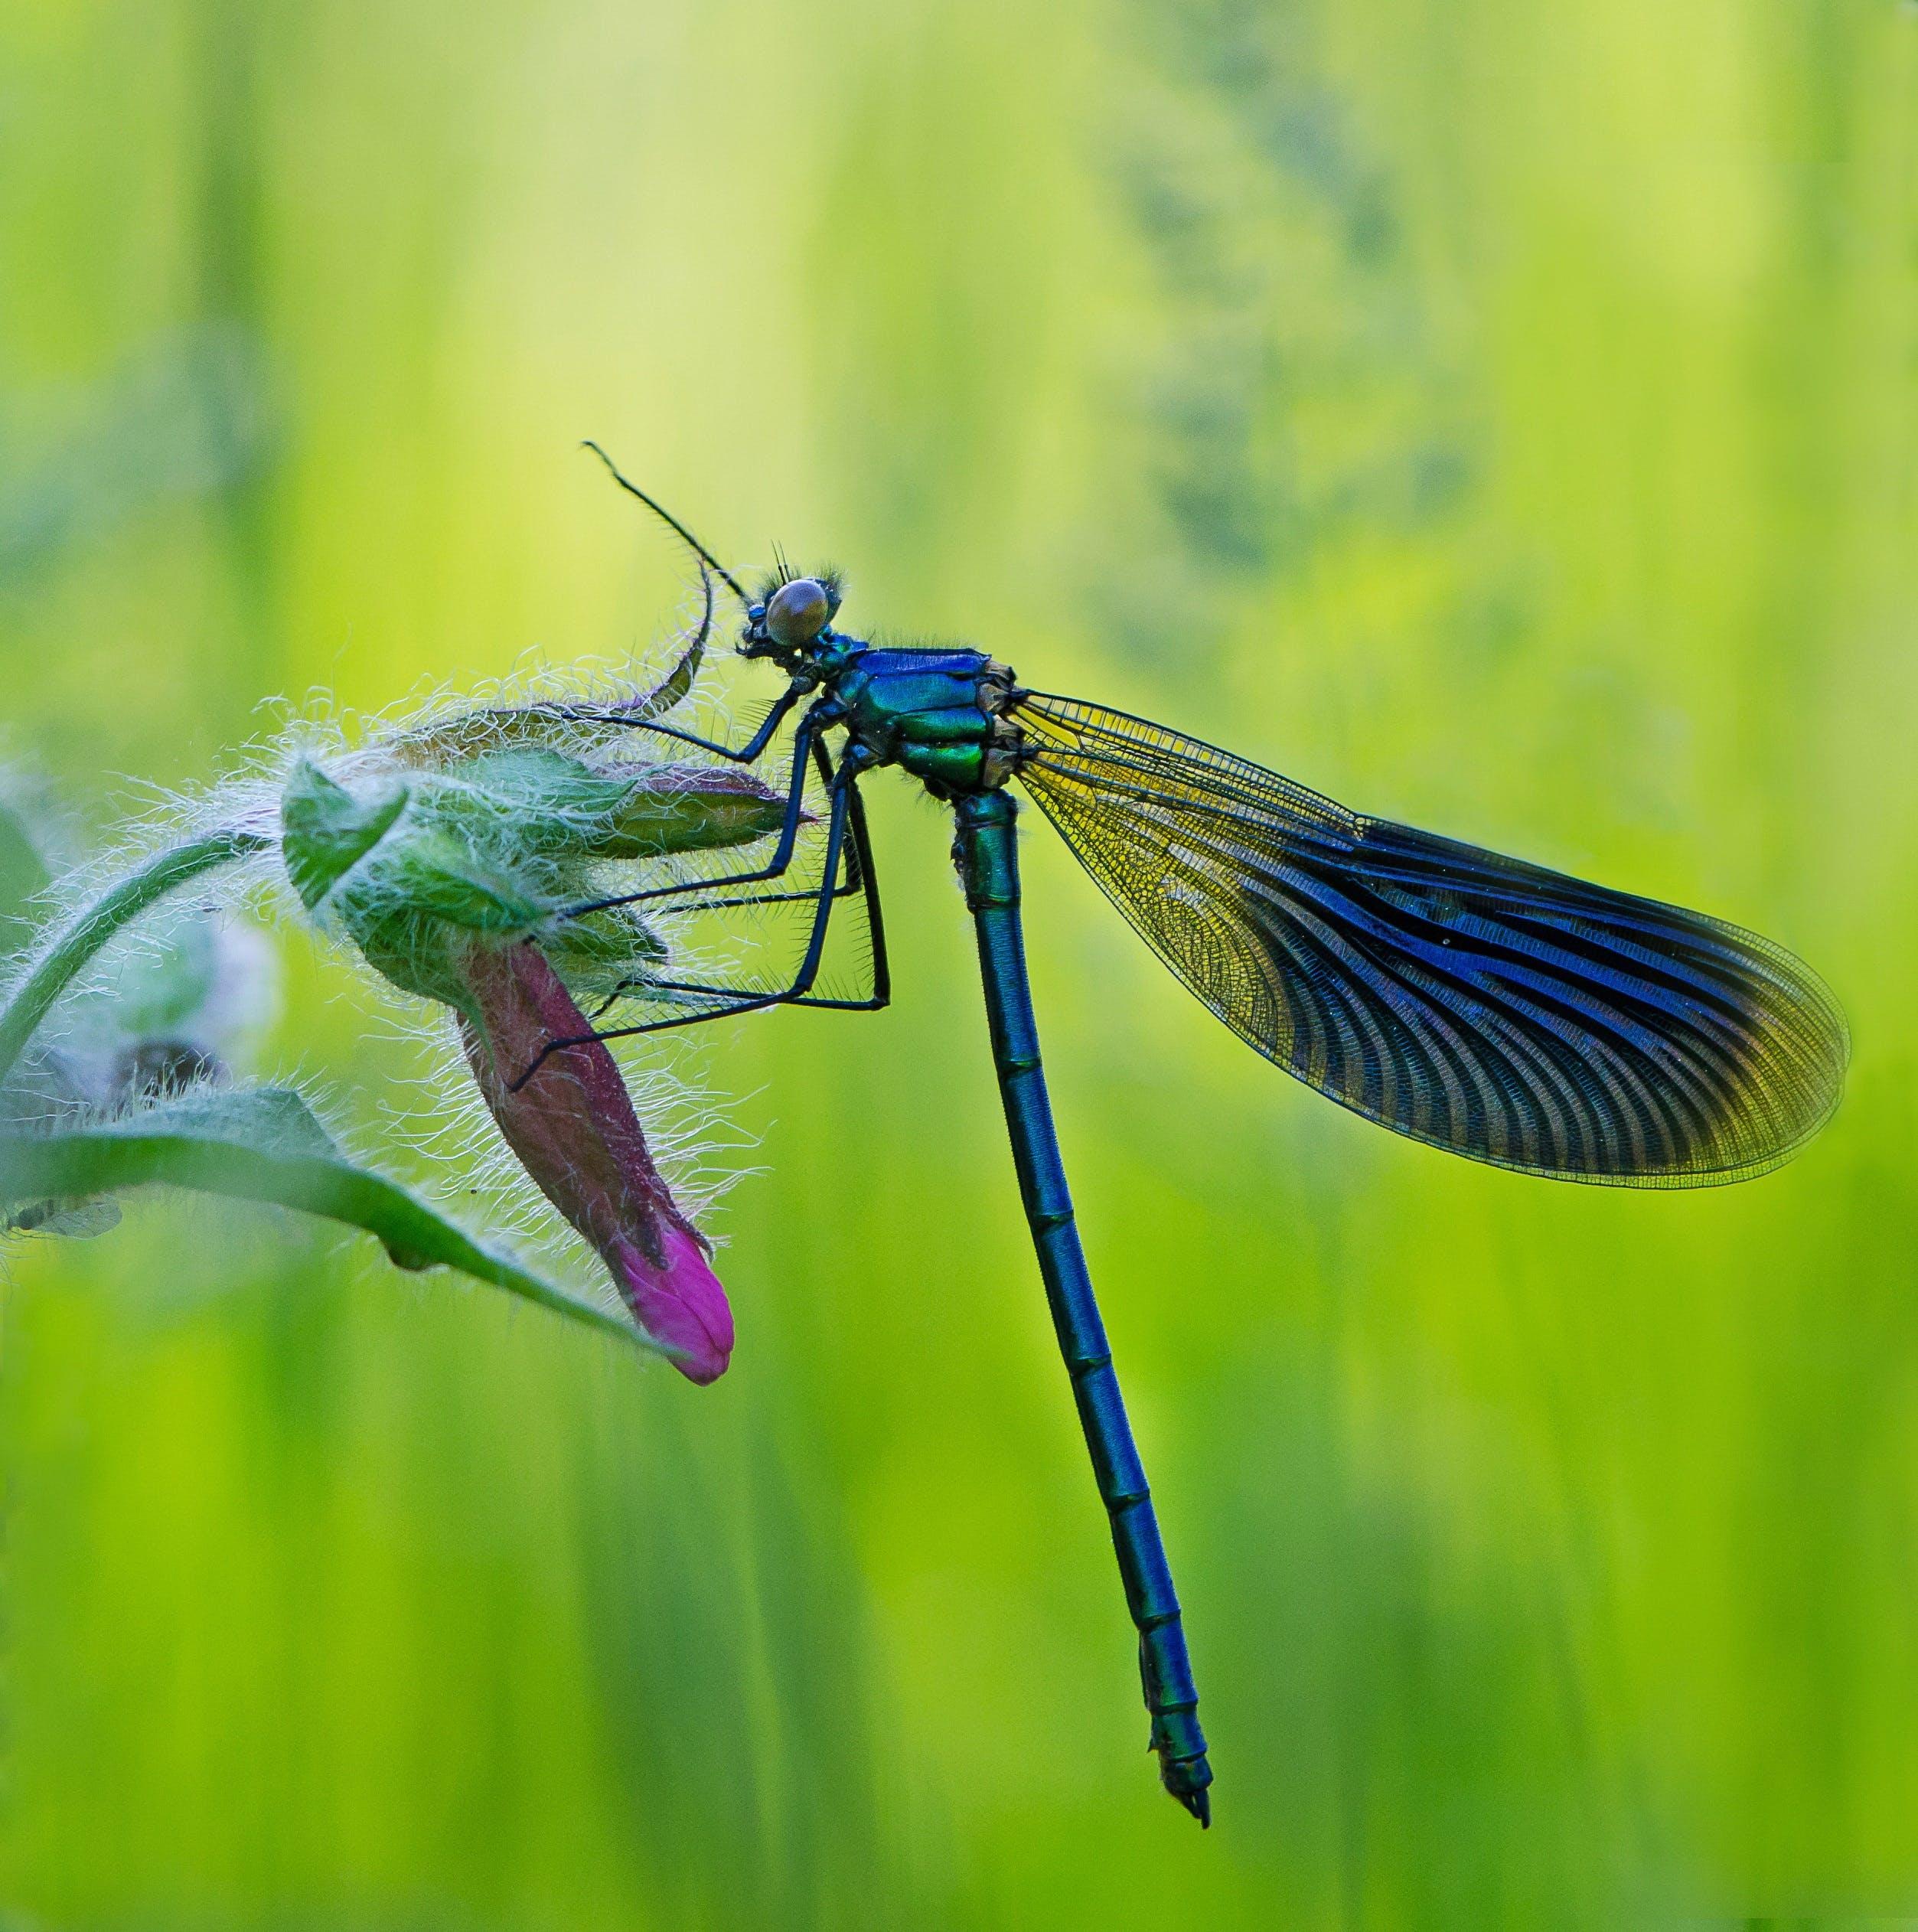 Free stock photo of nature, insects, ważka